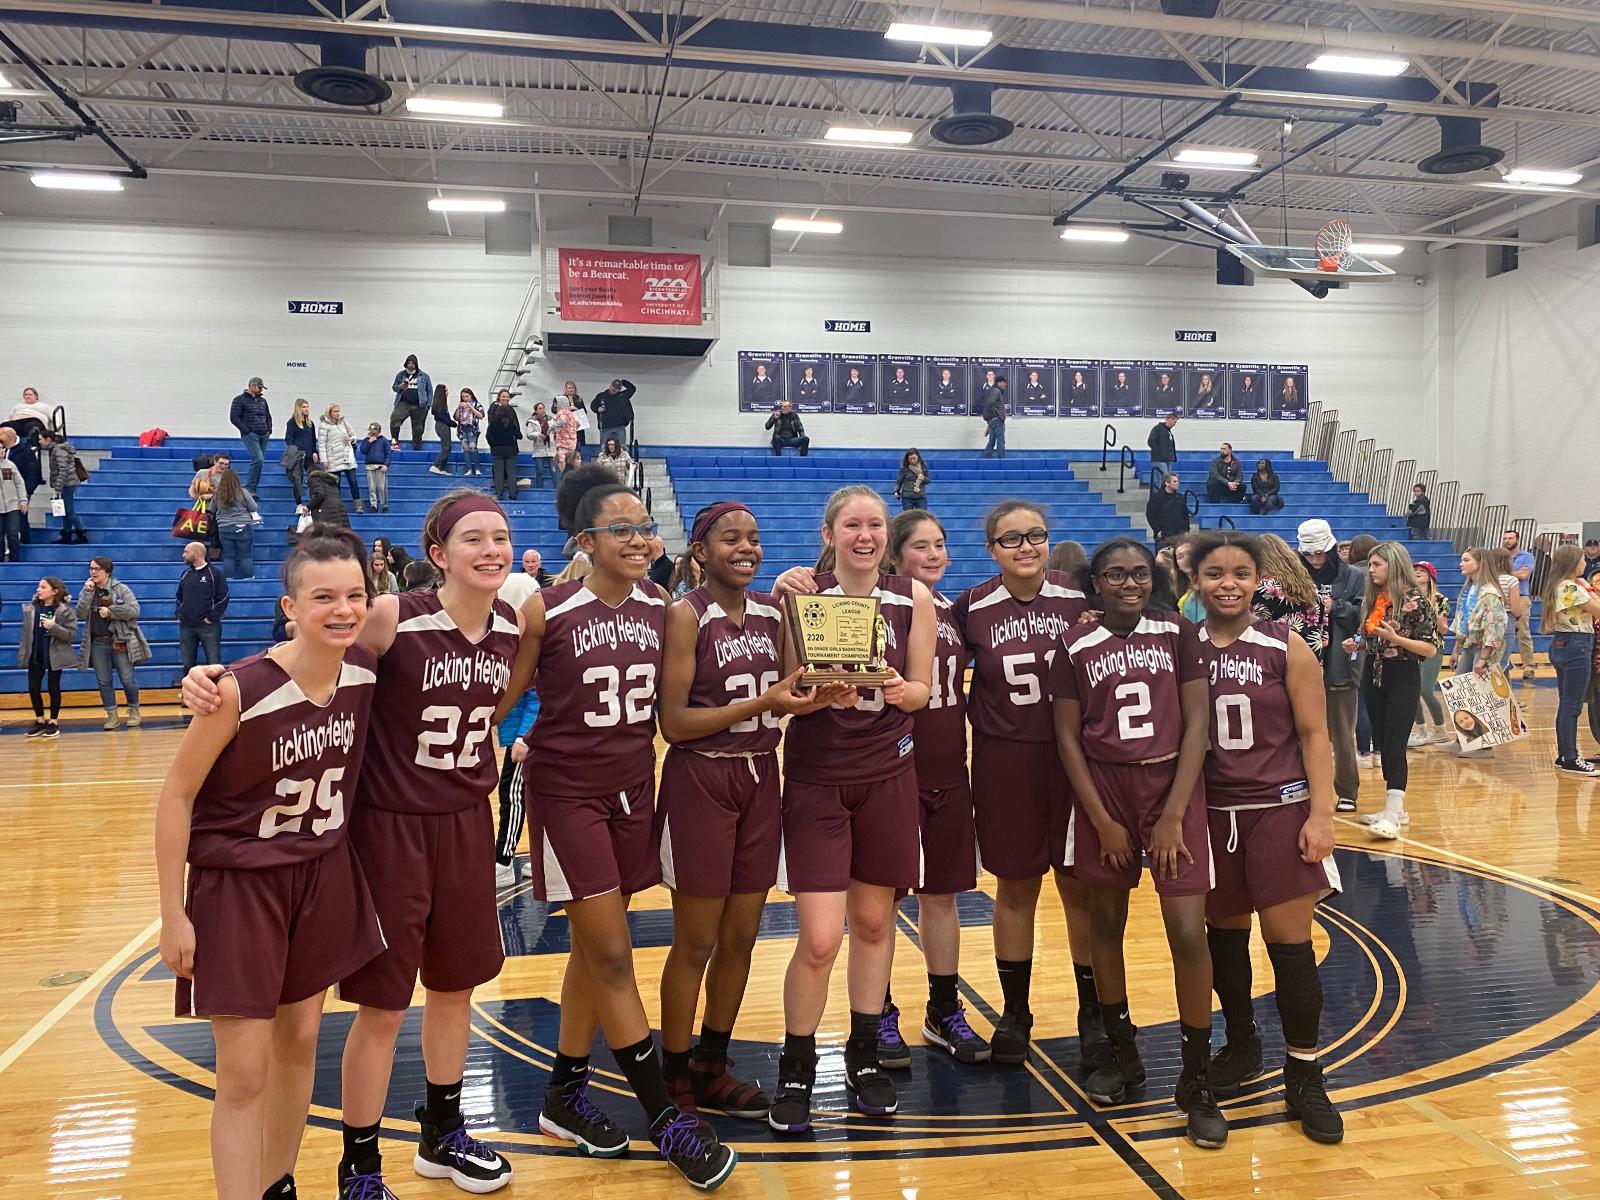 Congratulations 8th Grade Girls Basketball